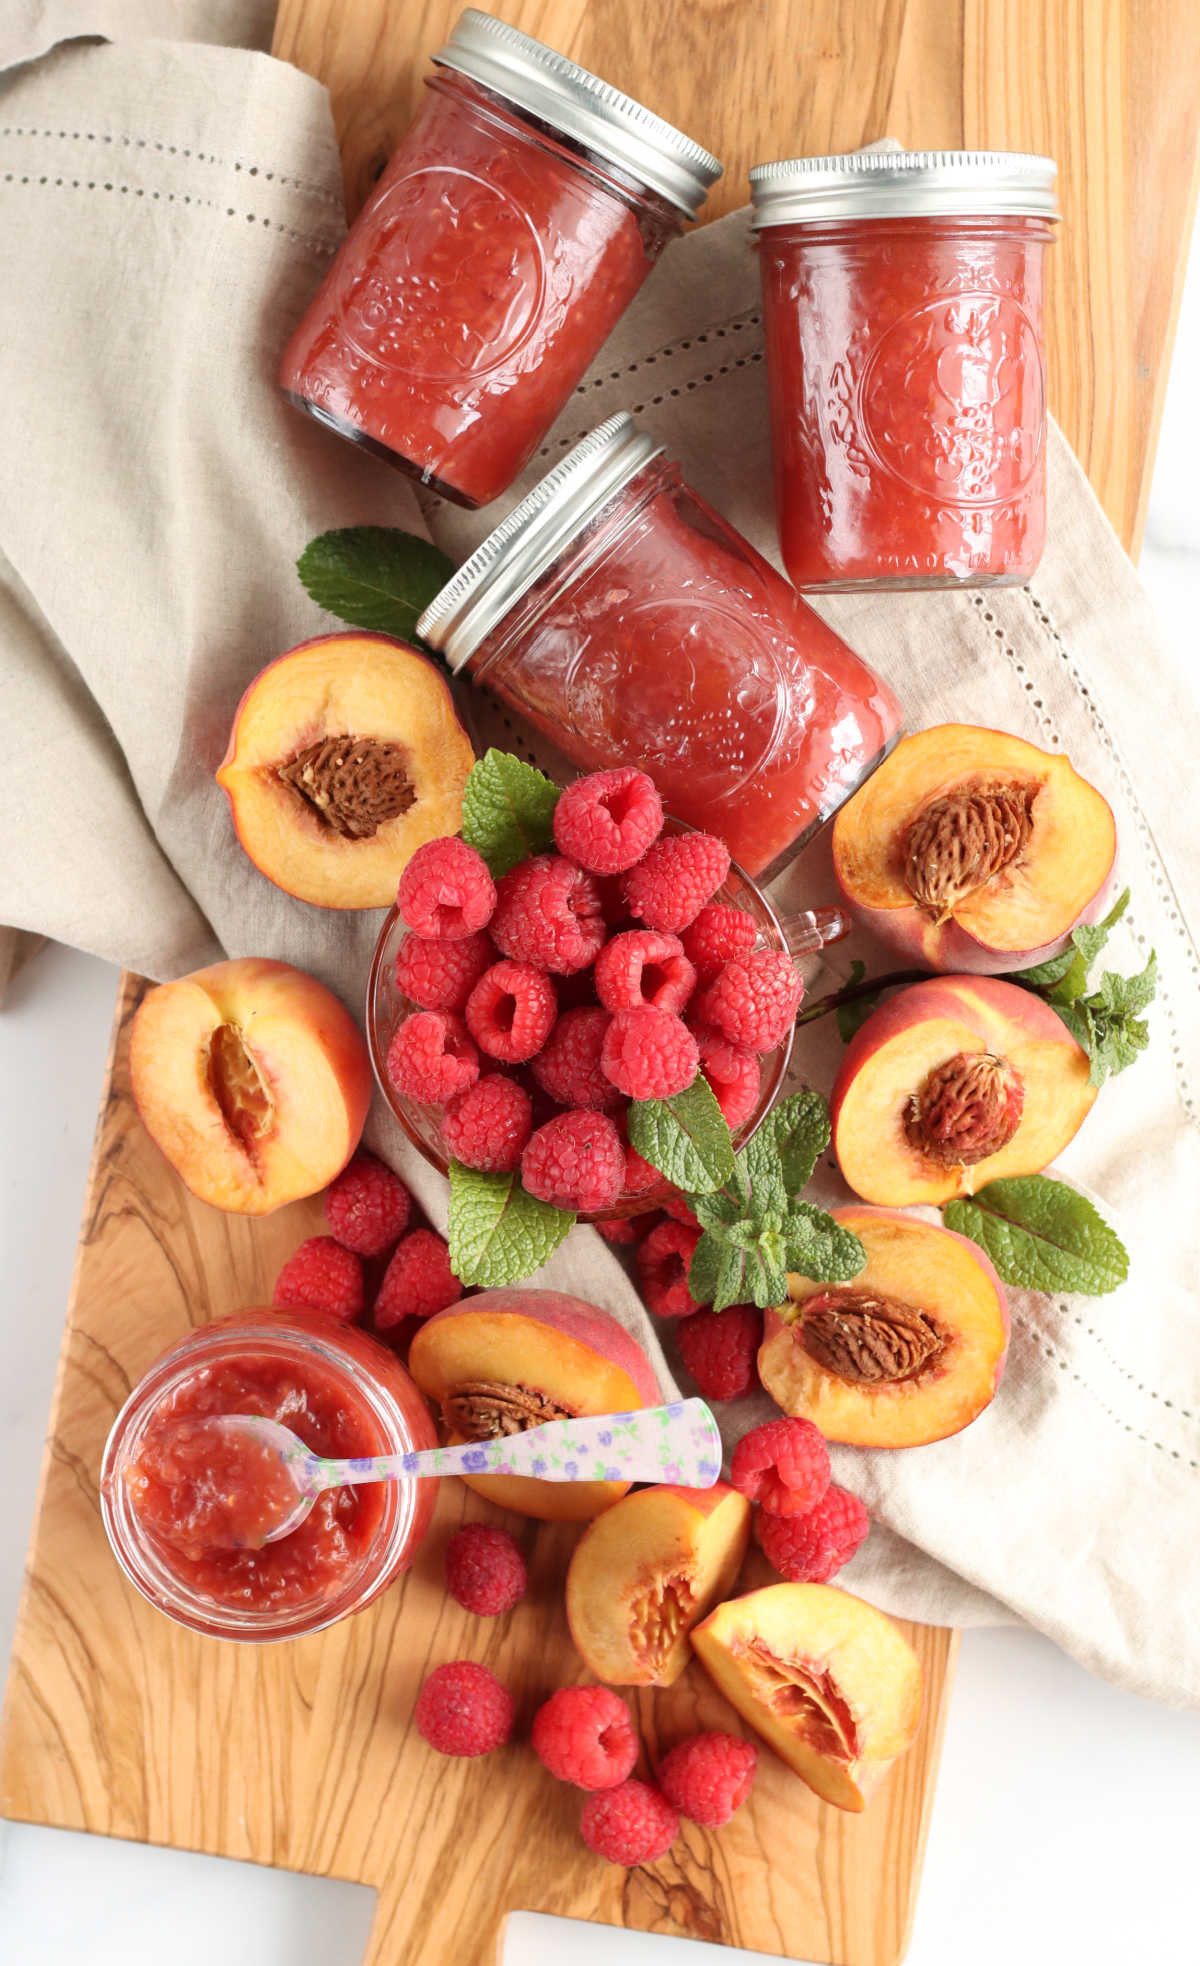 Three Mason jars with raspberry peach jam, fresh raspberries, peaches cut in half, fresh mint on wooden cutting board.